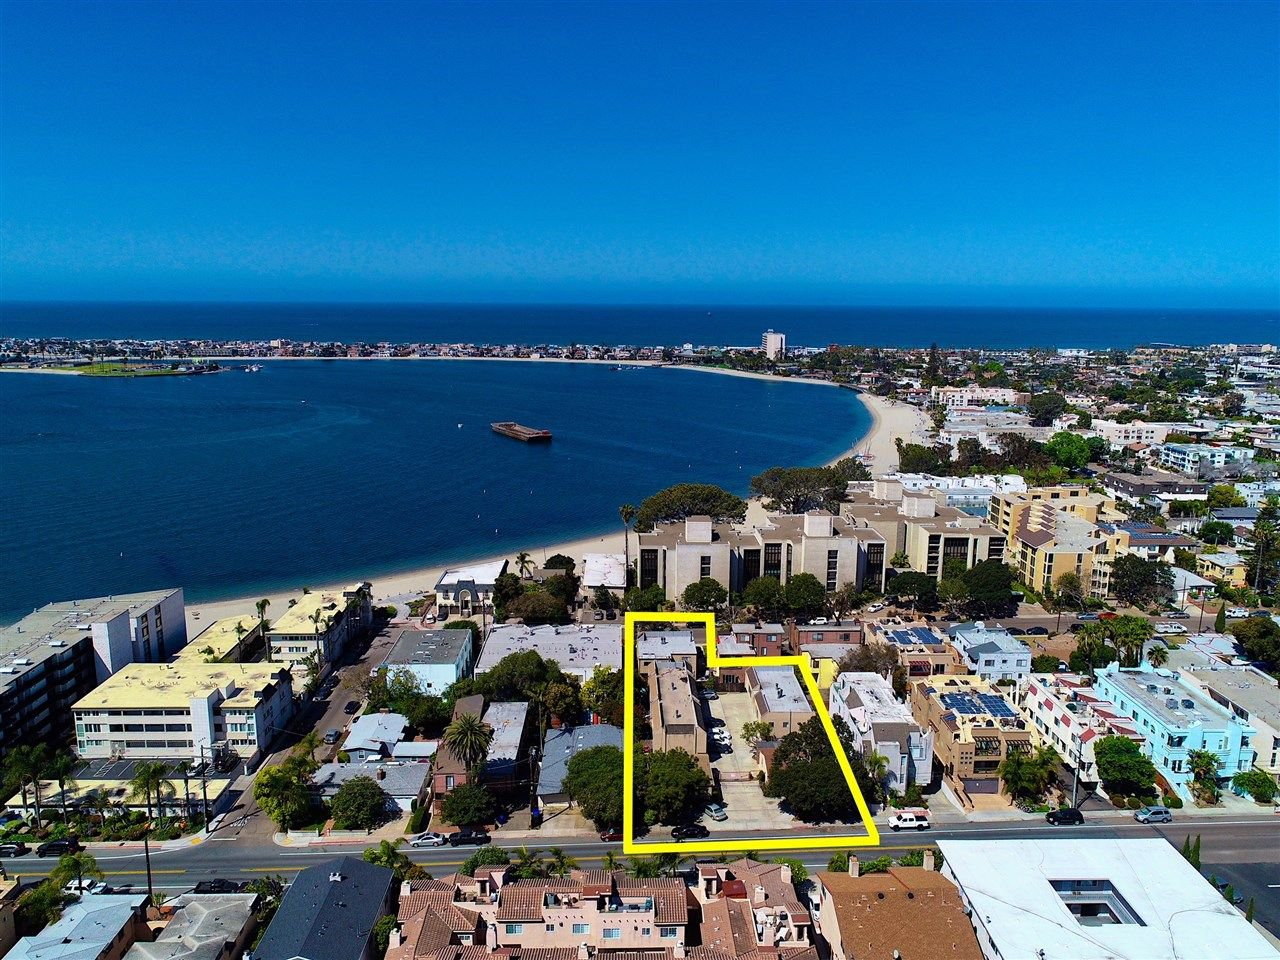 Main Photo: Property for sale: 3958-66 Riviera/3929-33 Gresham in San Diego